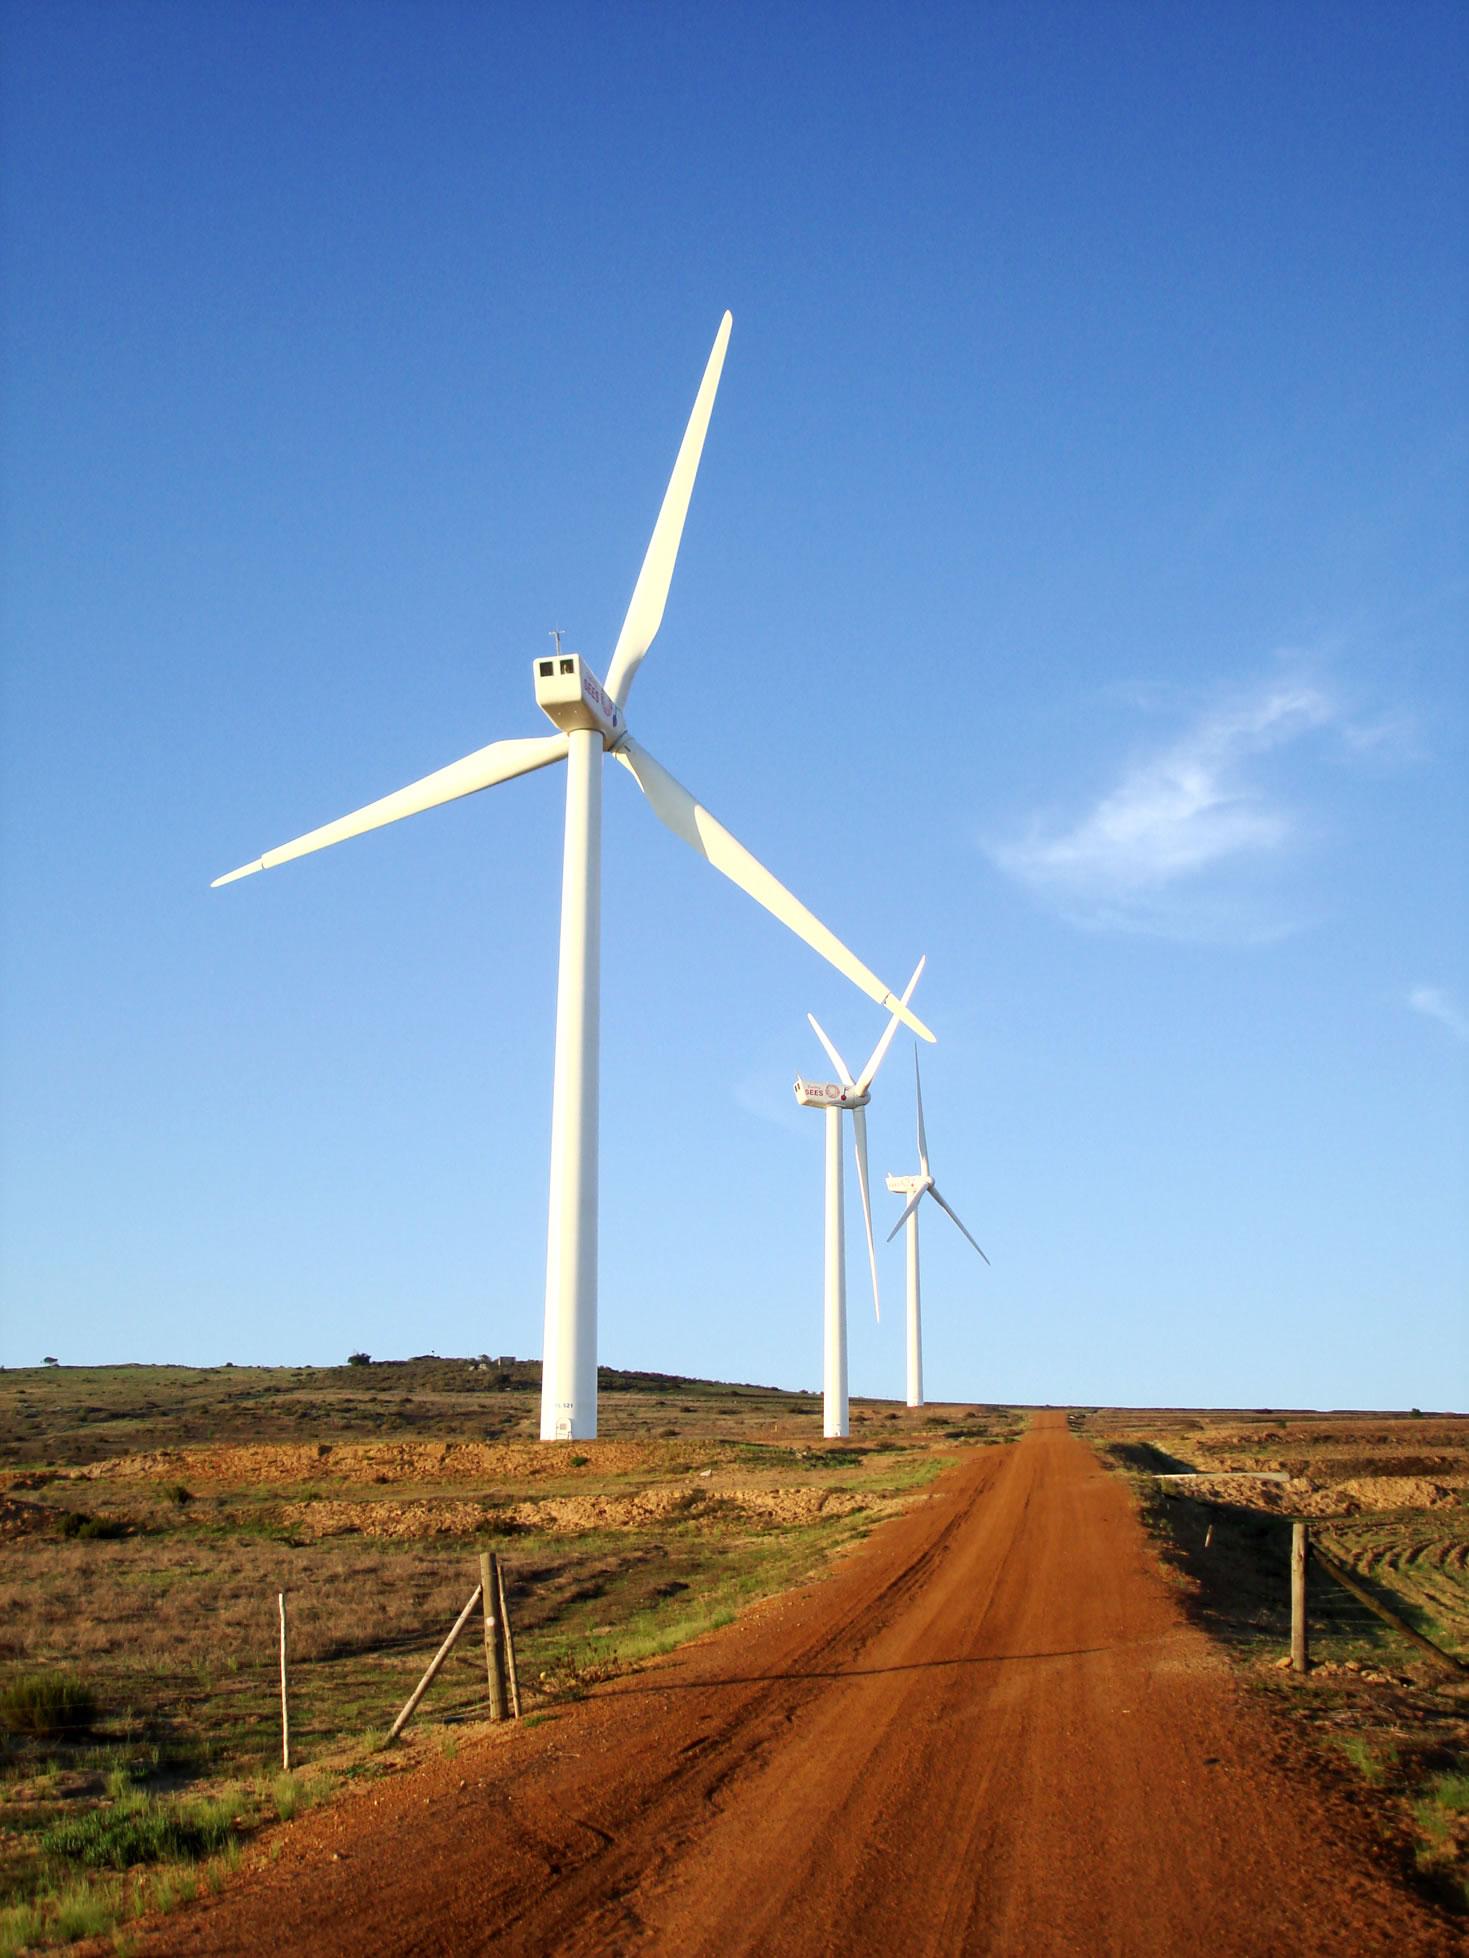 Wind Power Pics Wind Power[edit